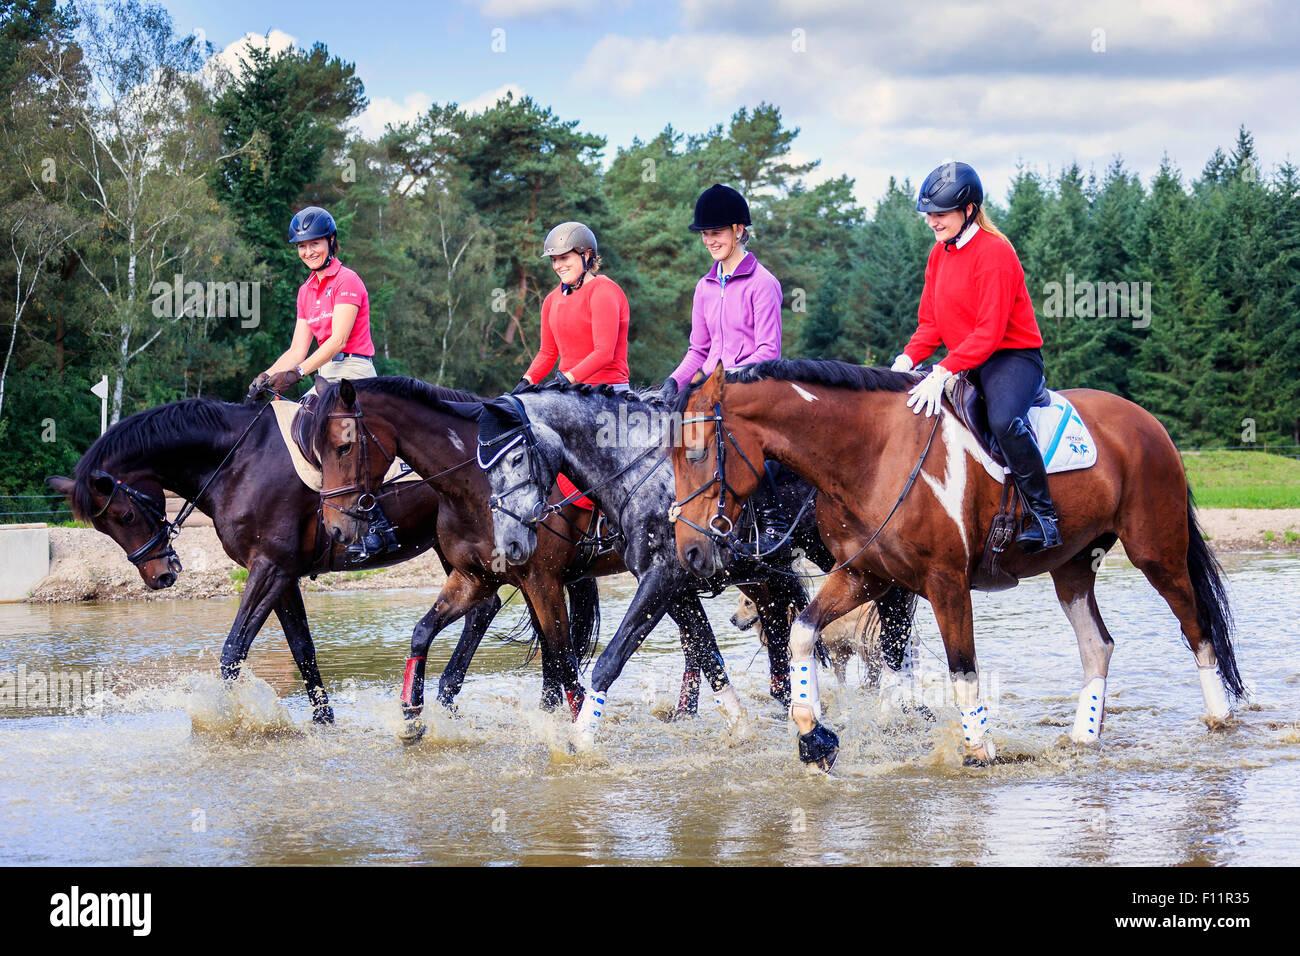 Cuatro jinetes a caballo Warmblood agua superficial Imagen De Stock